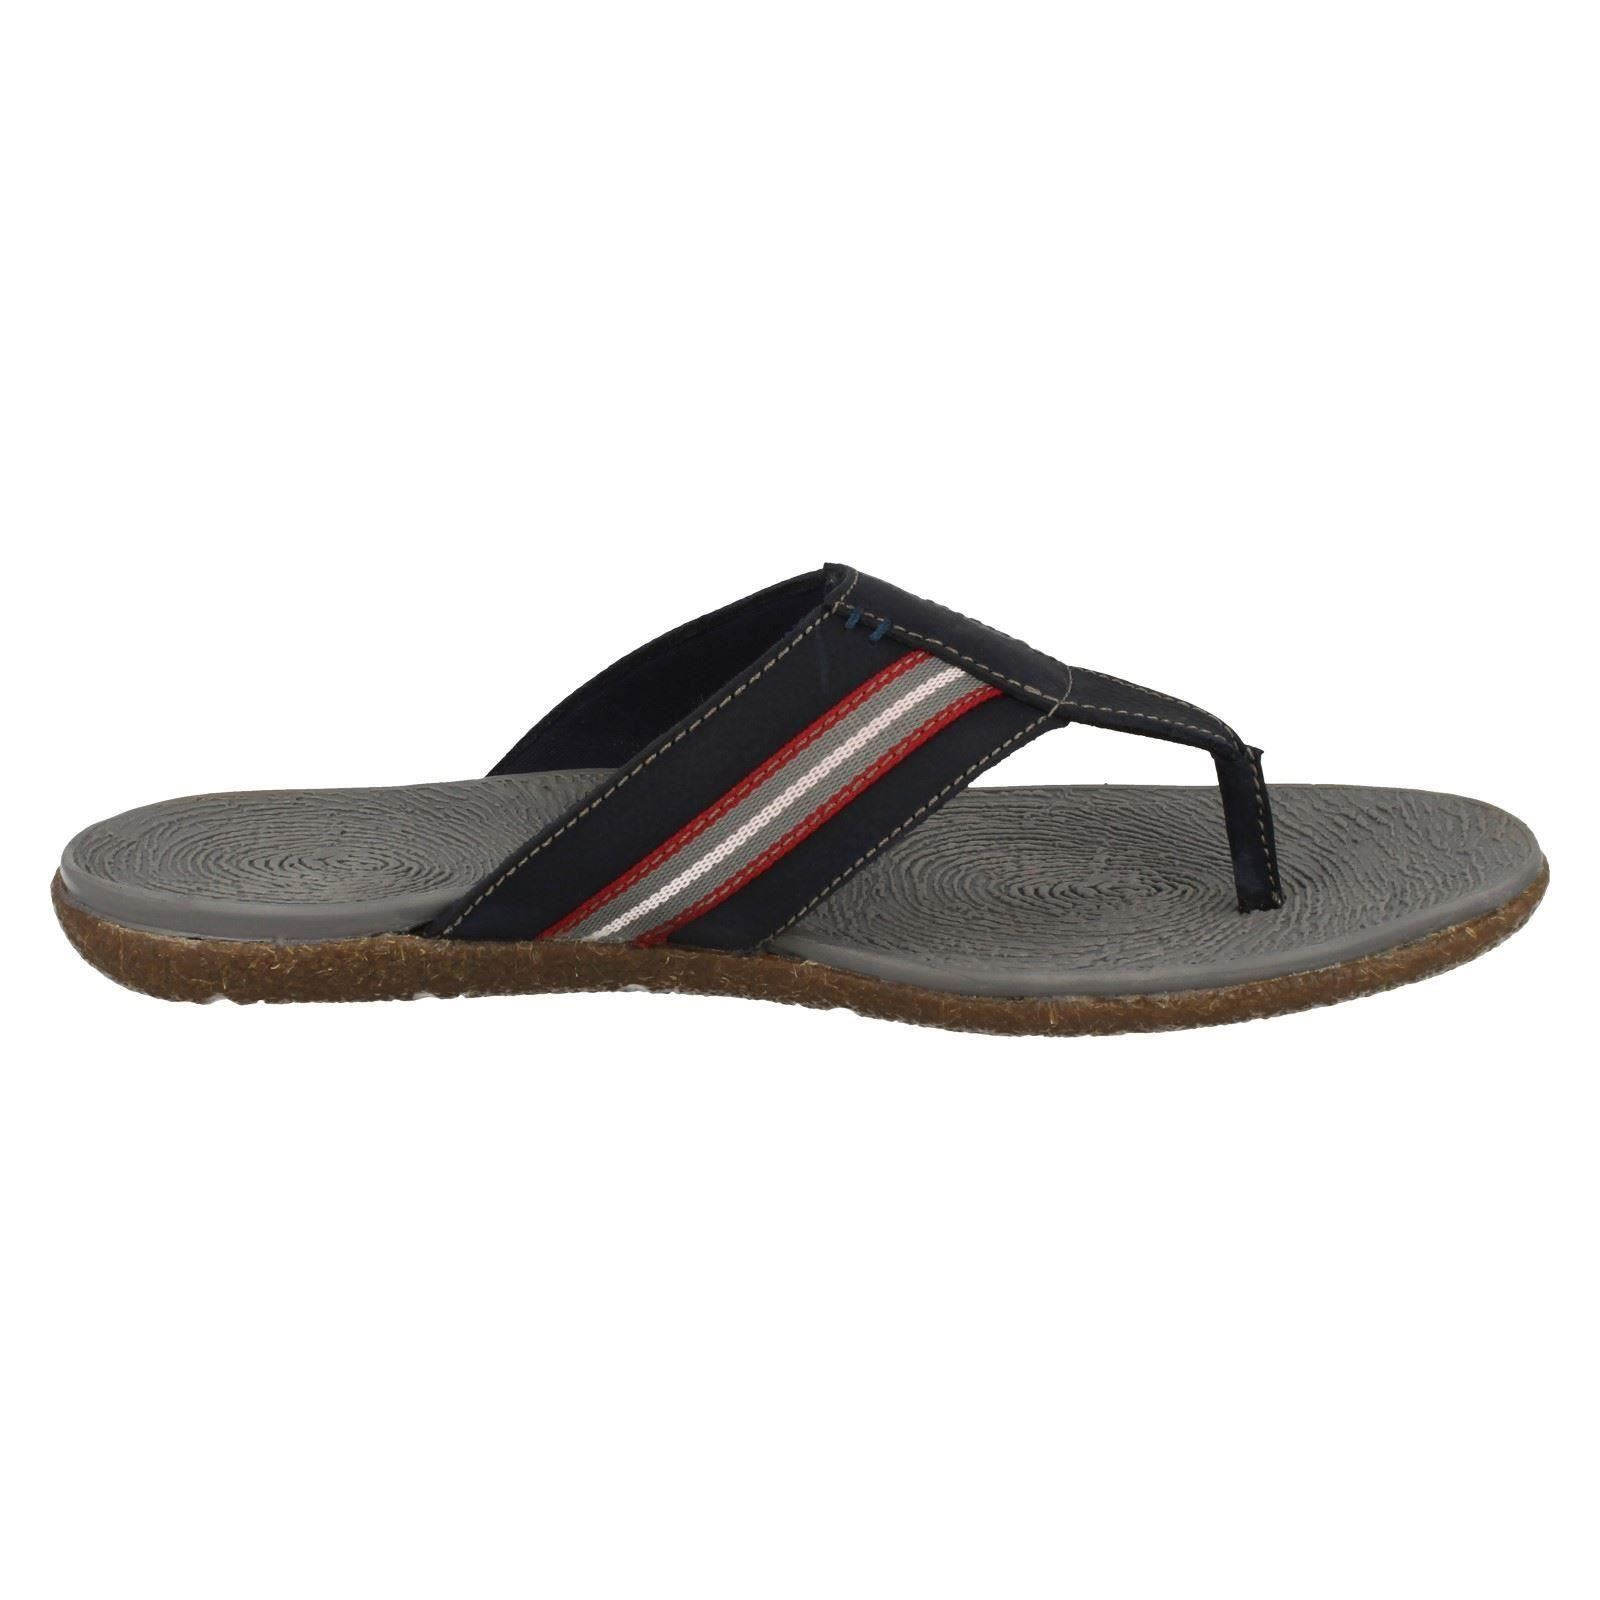 Mens Hush Puppies Summer Sandals /'Frame Toe Post/'